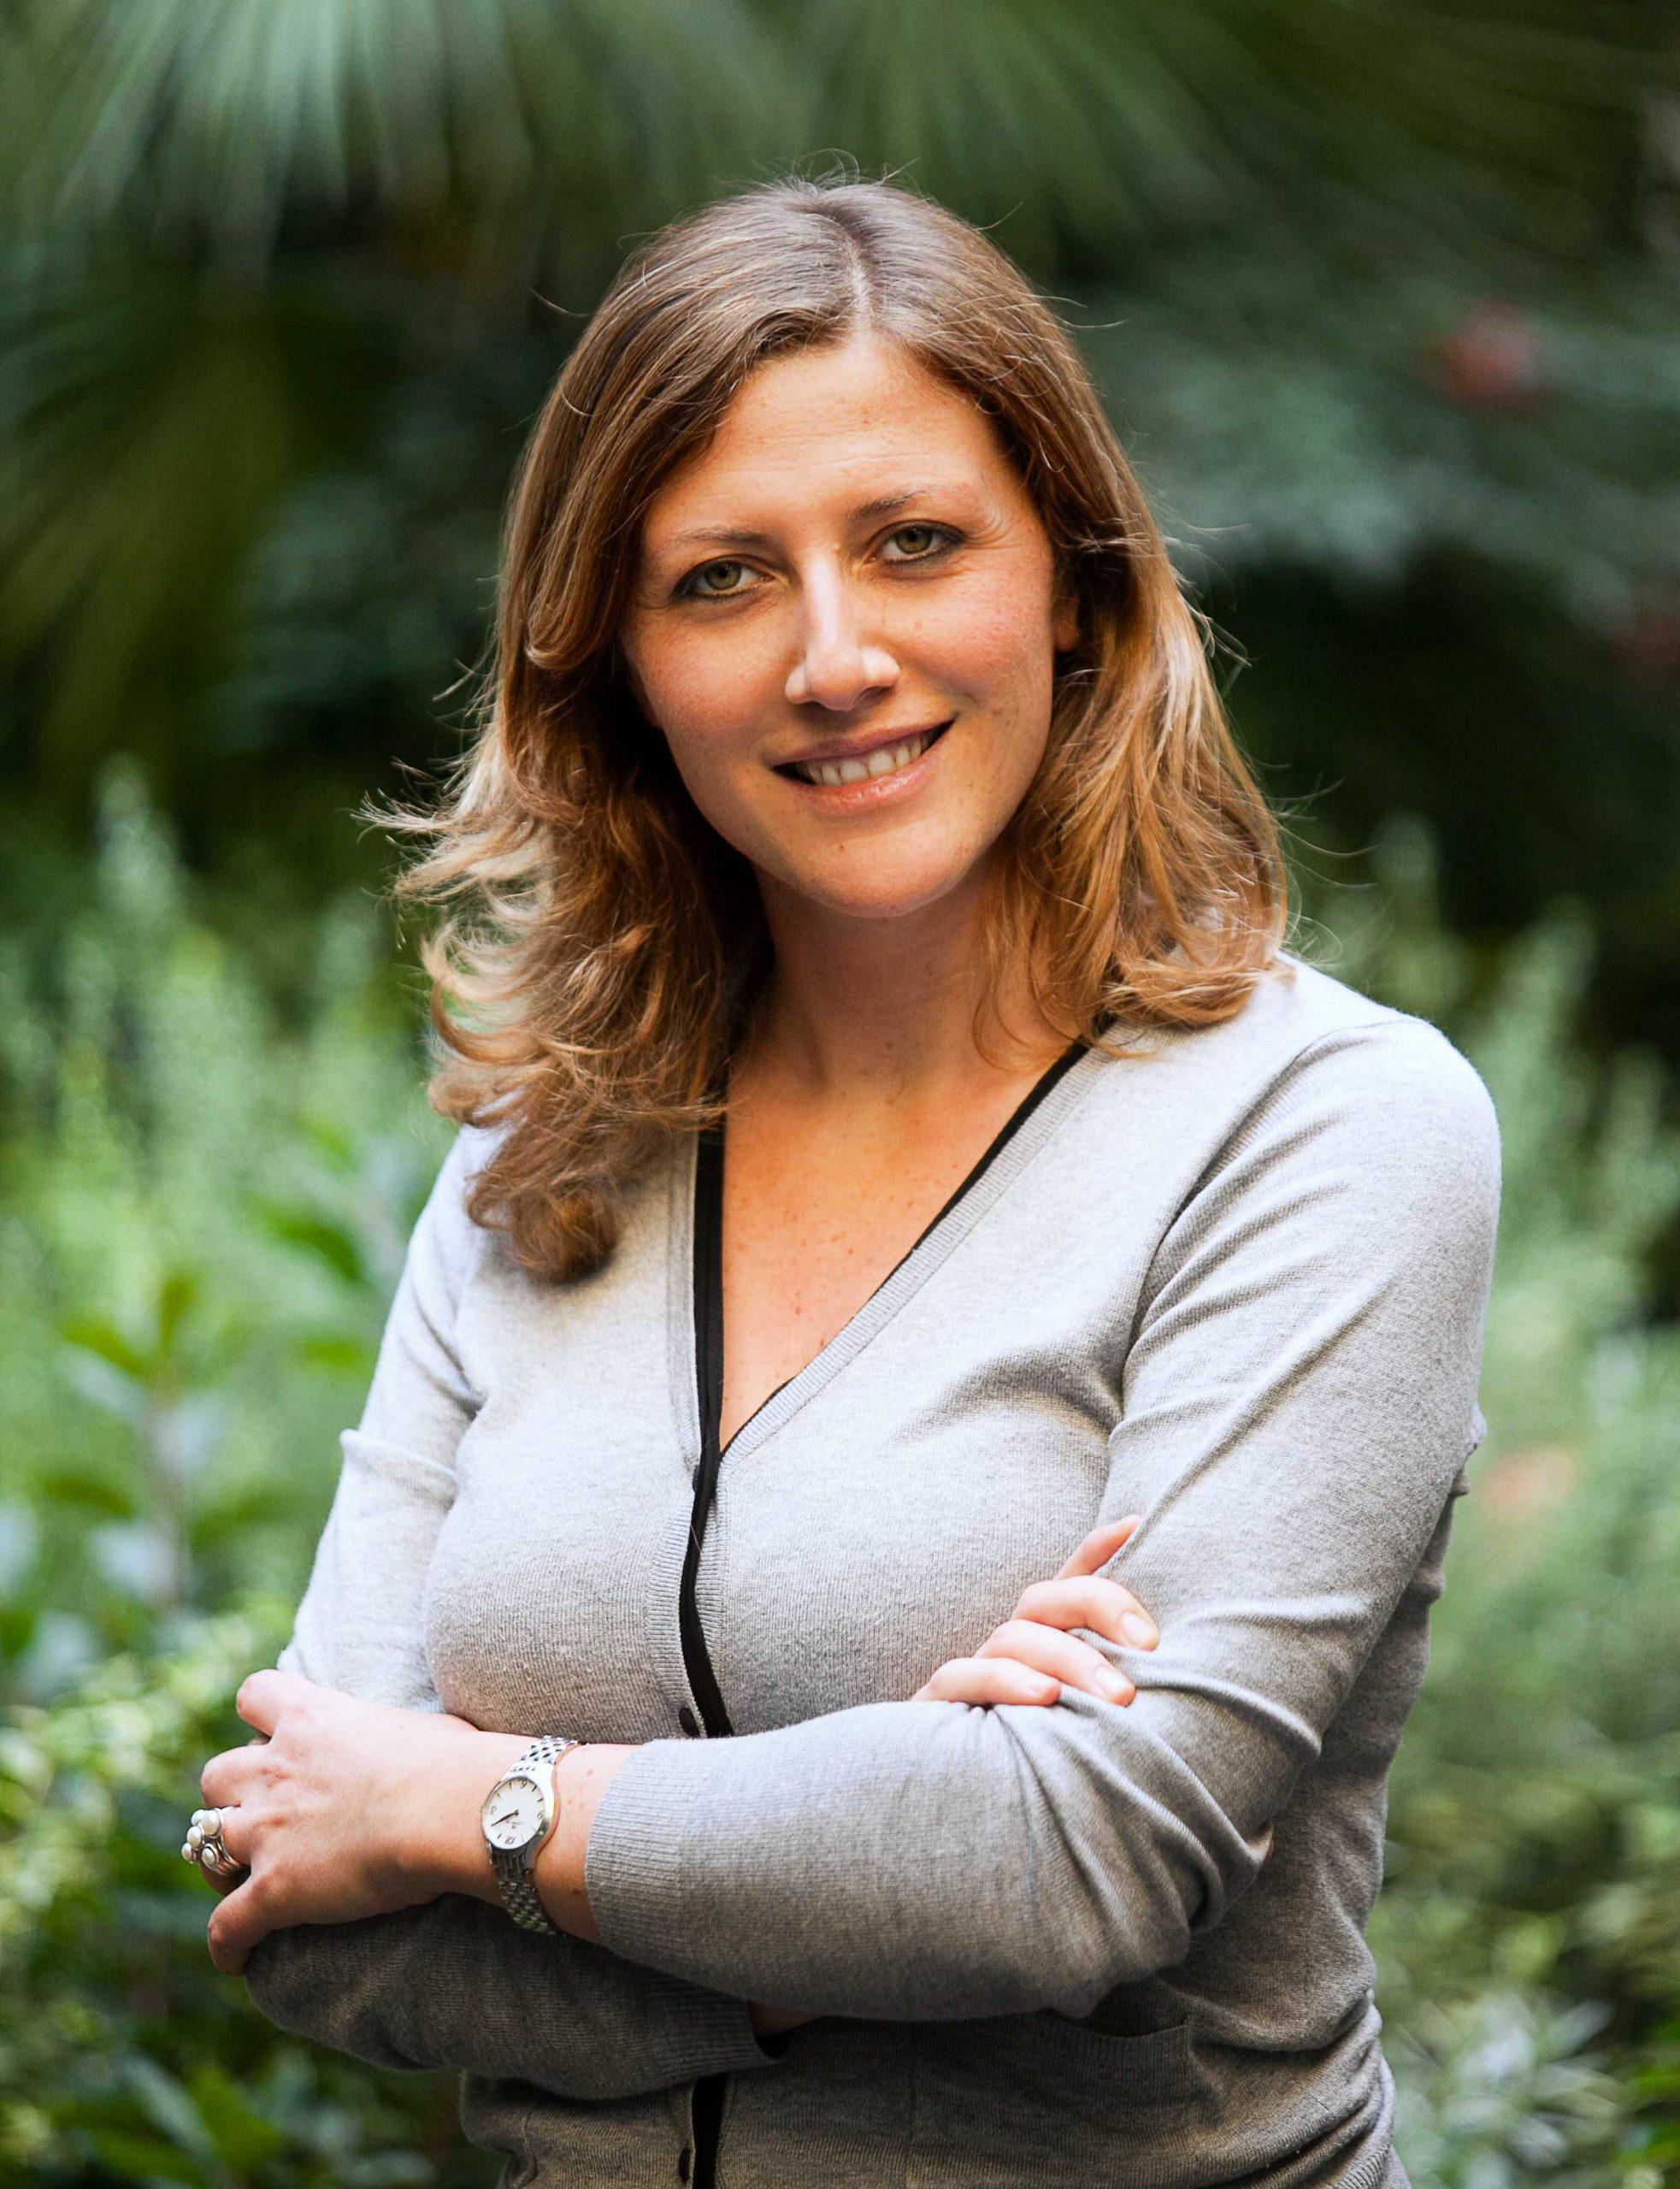 Nicoletta Pirozzi Lectorinfabula Lector in Fabula